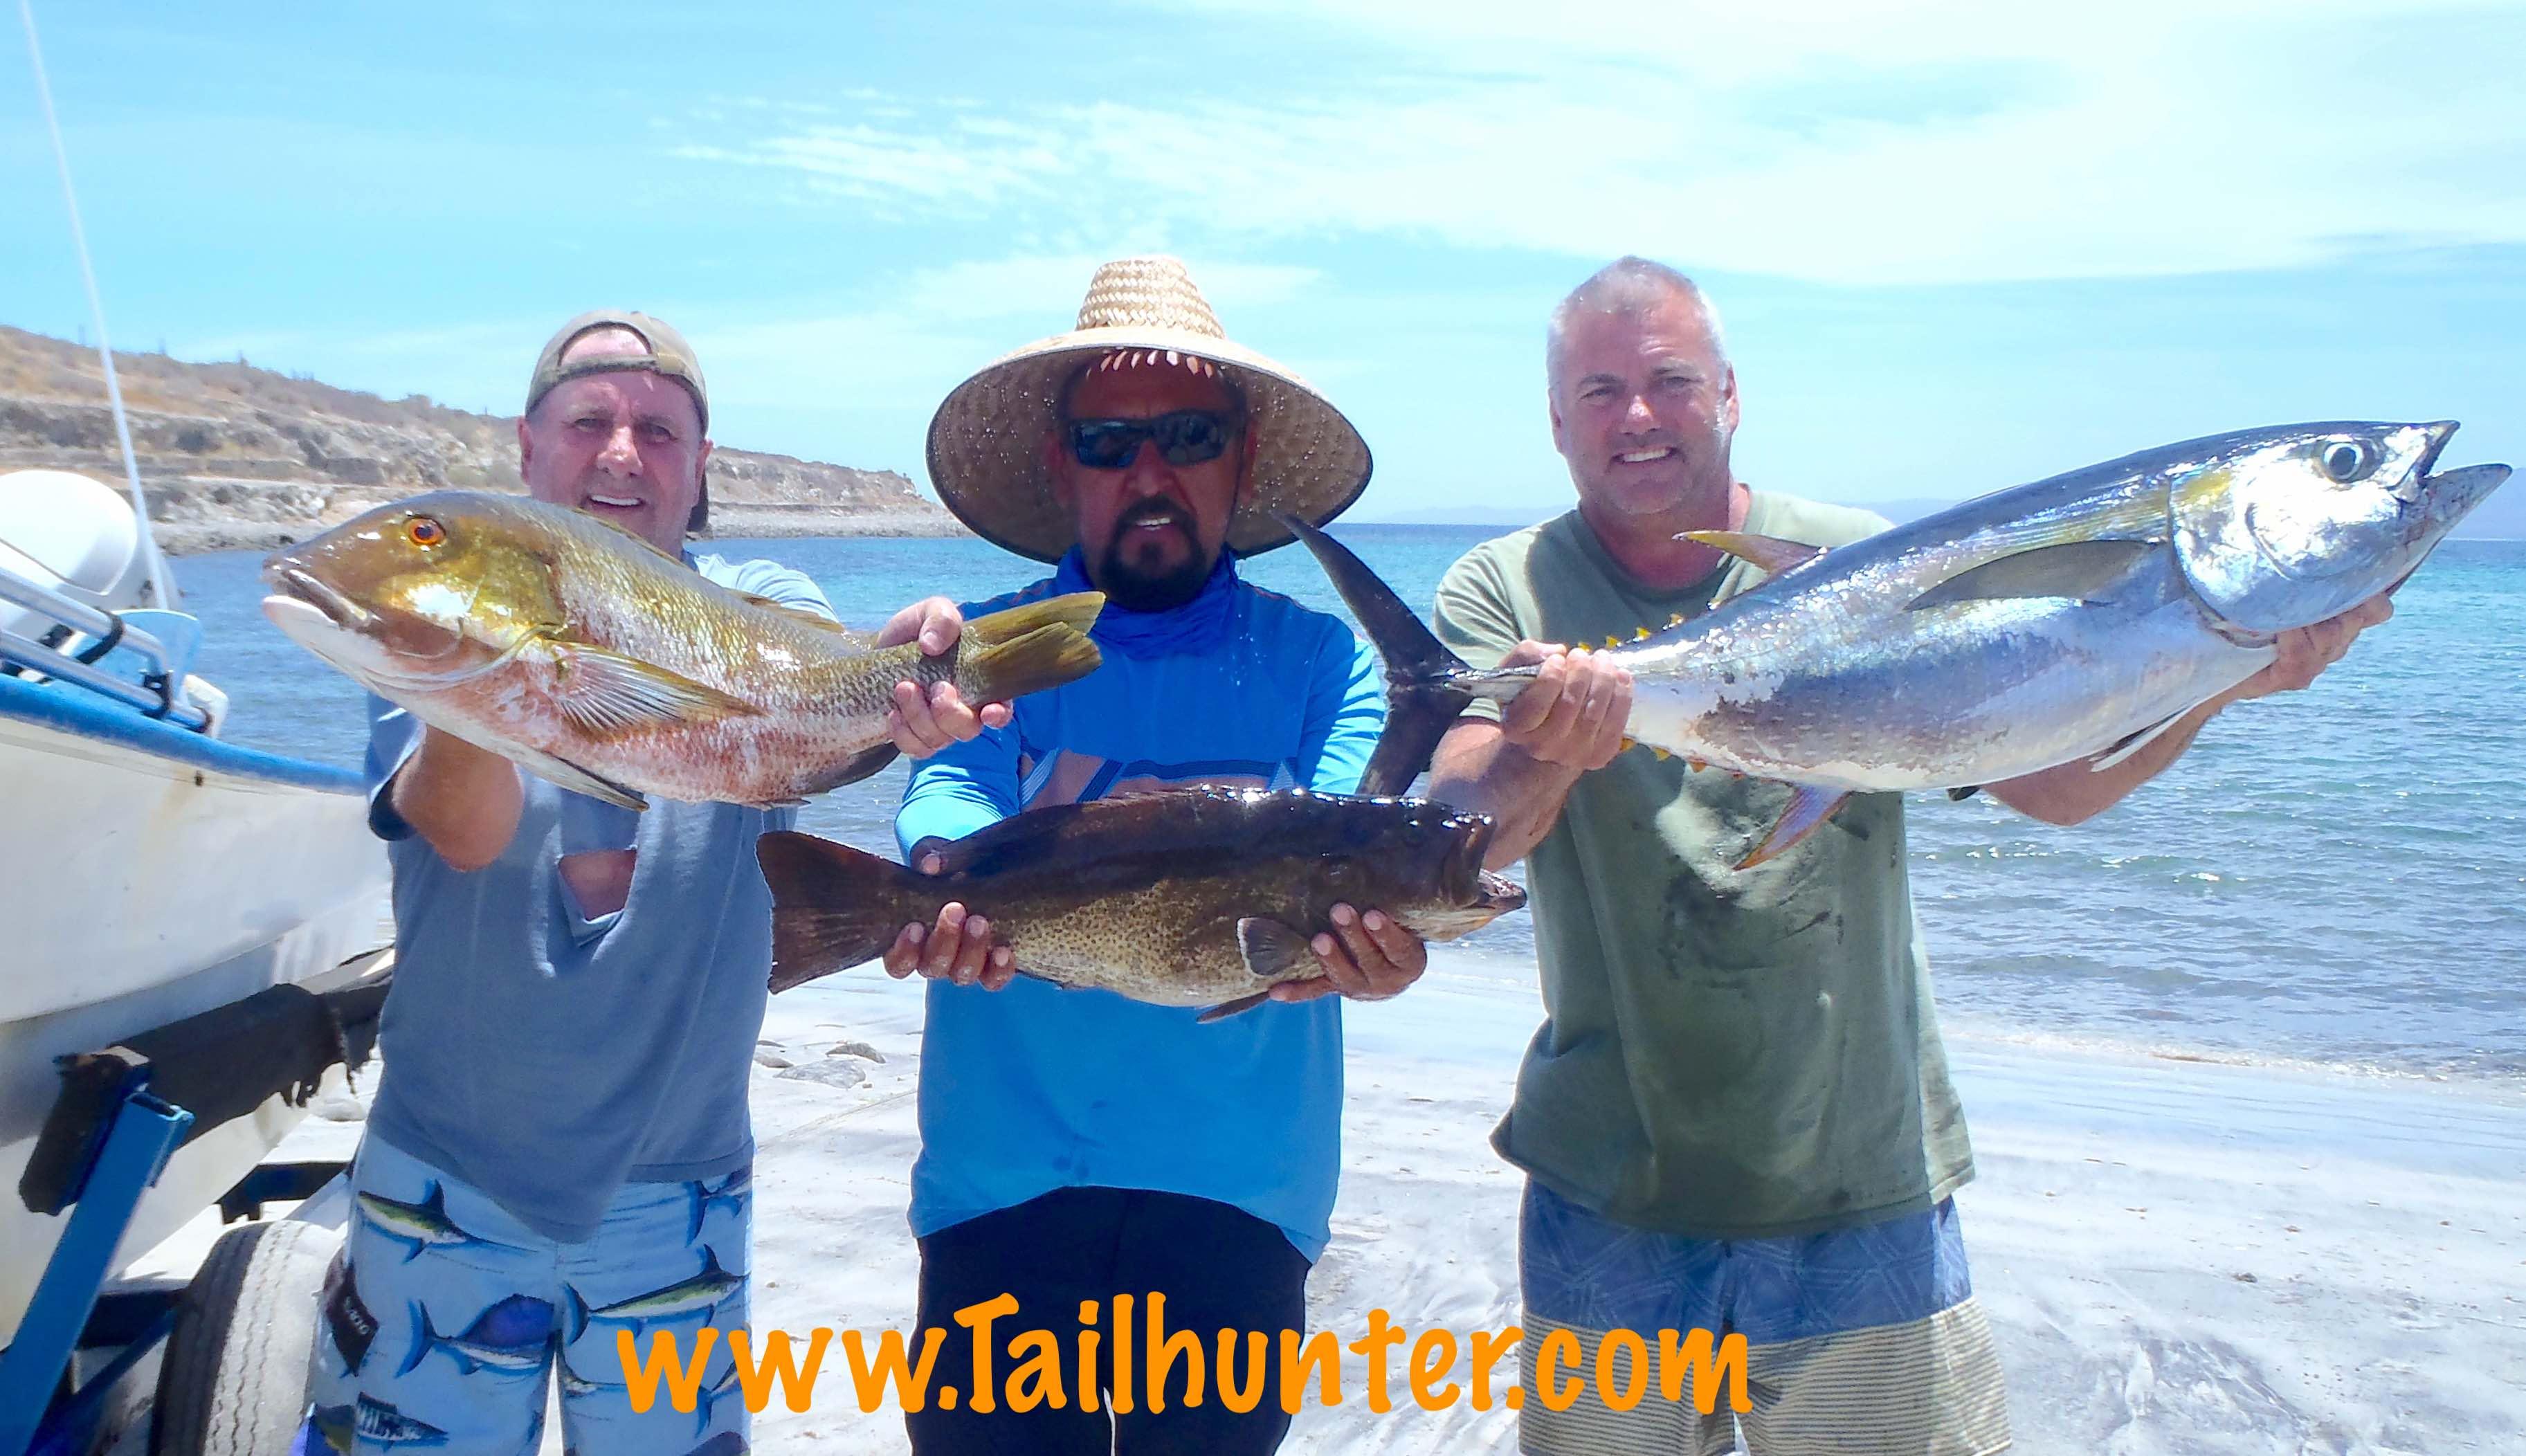 Tailhunter Fish Report La Paz Baja California Sur Mexico